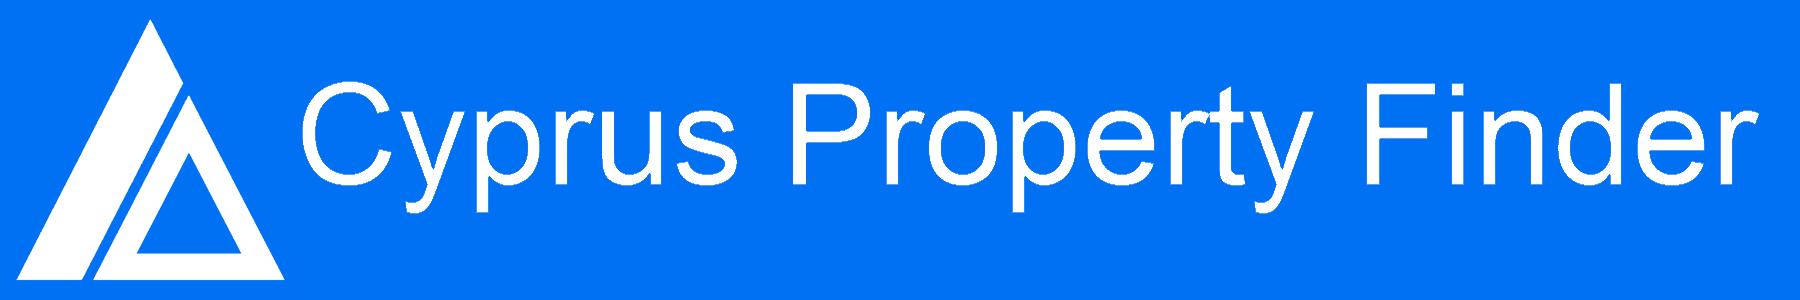 Cyprus Property Finder